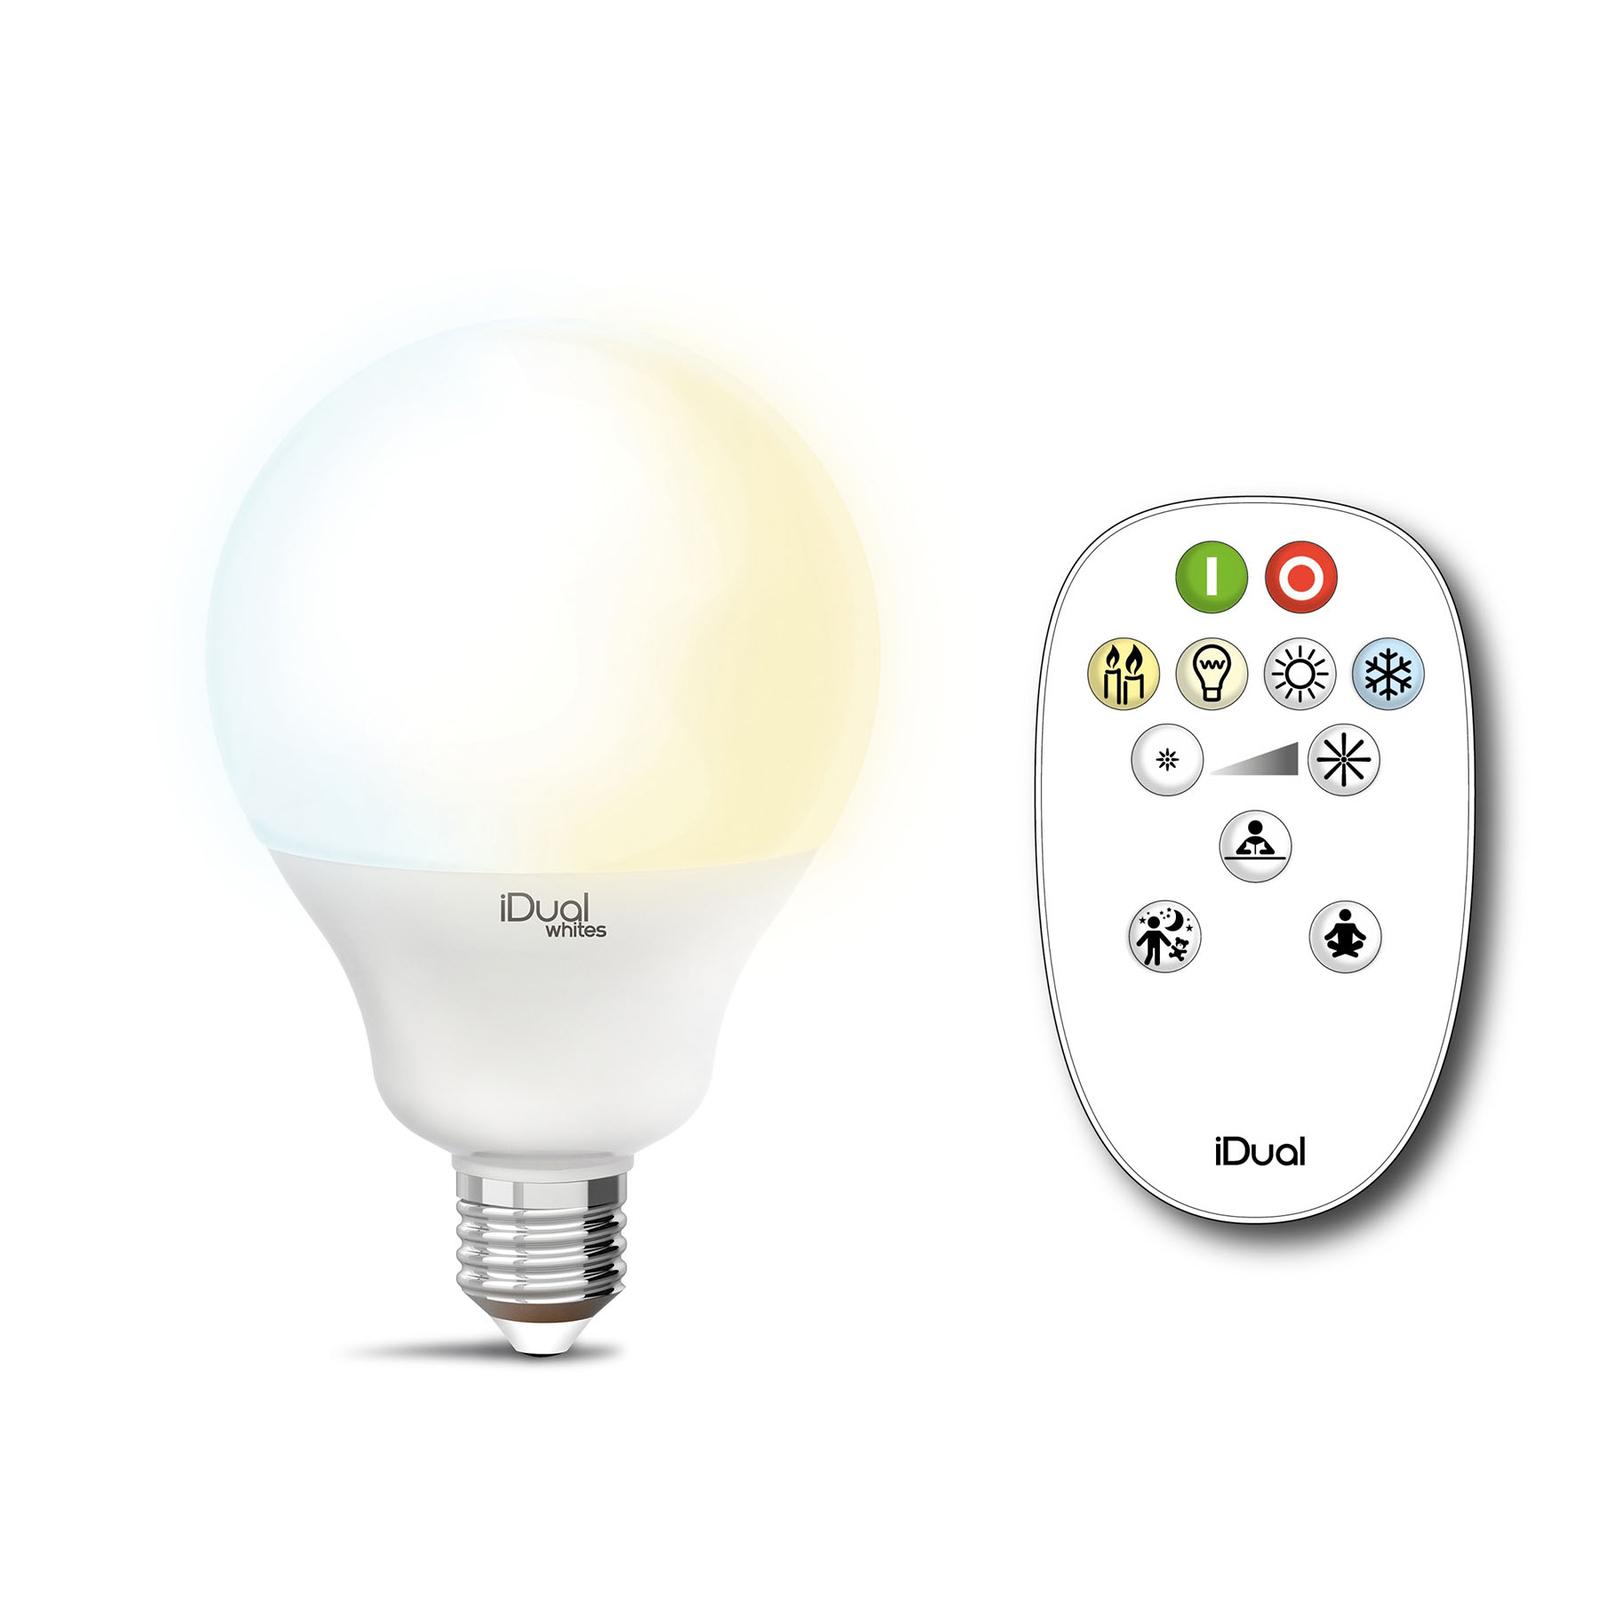 iDual Whites Globe E27 G100 12,5W, télécommande